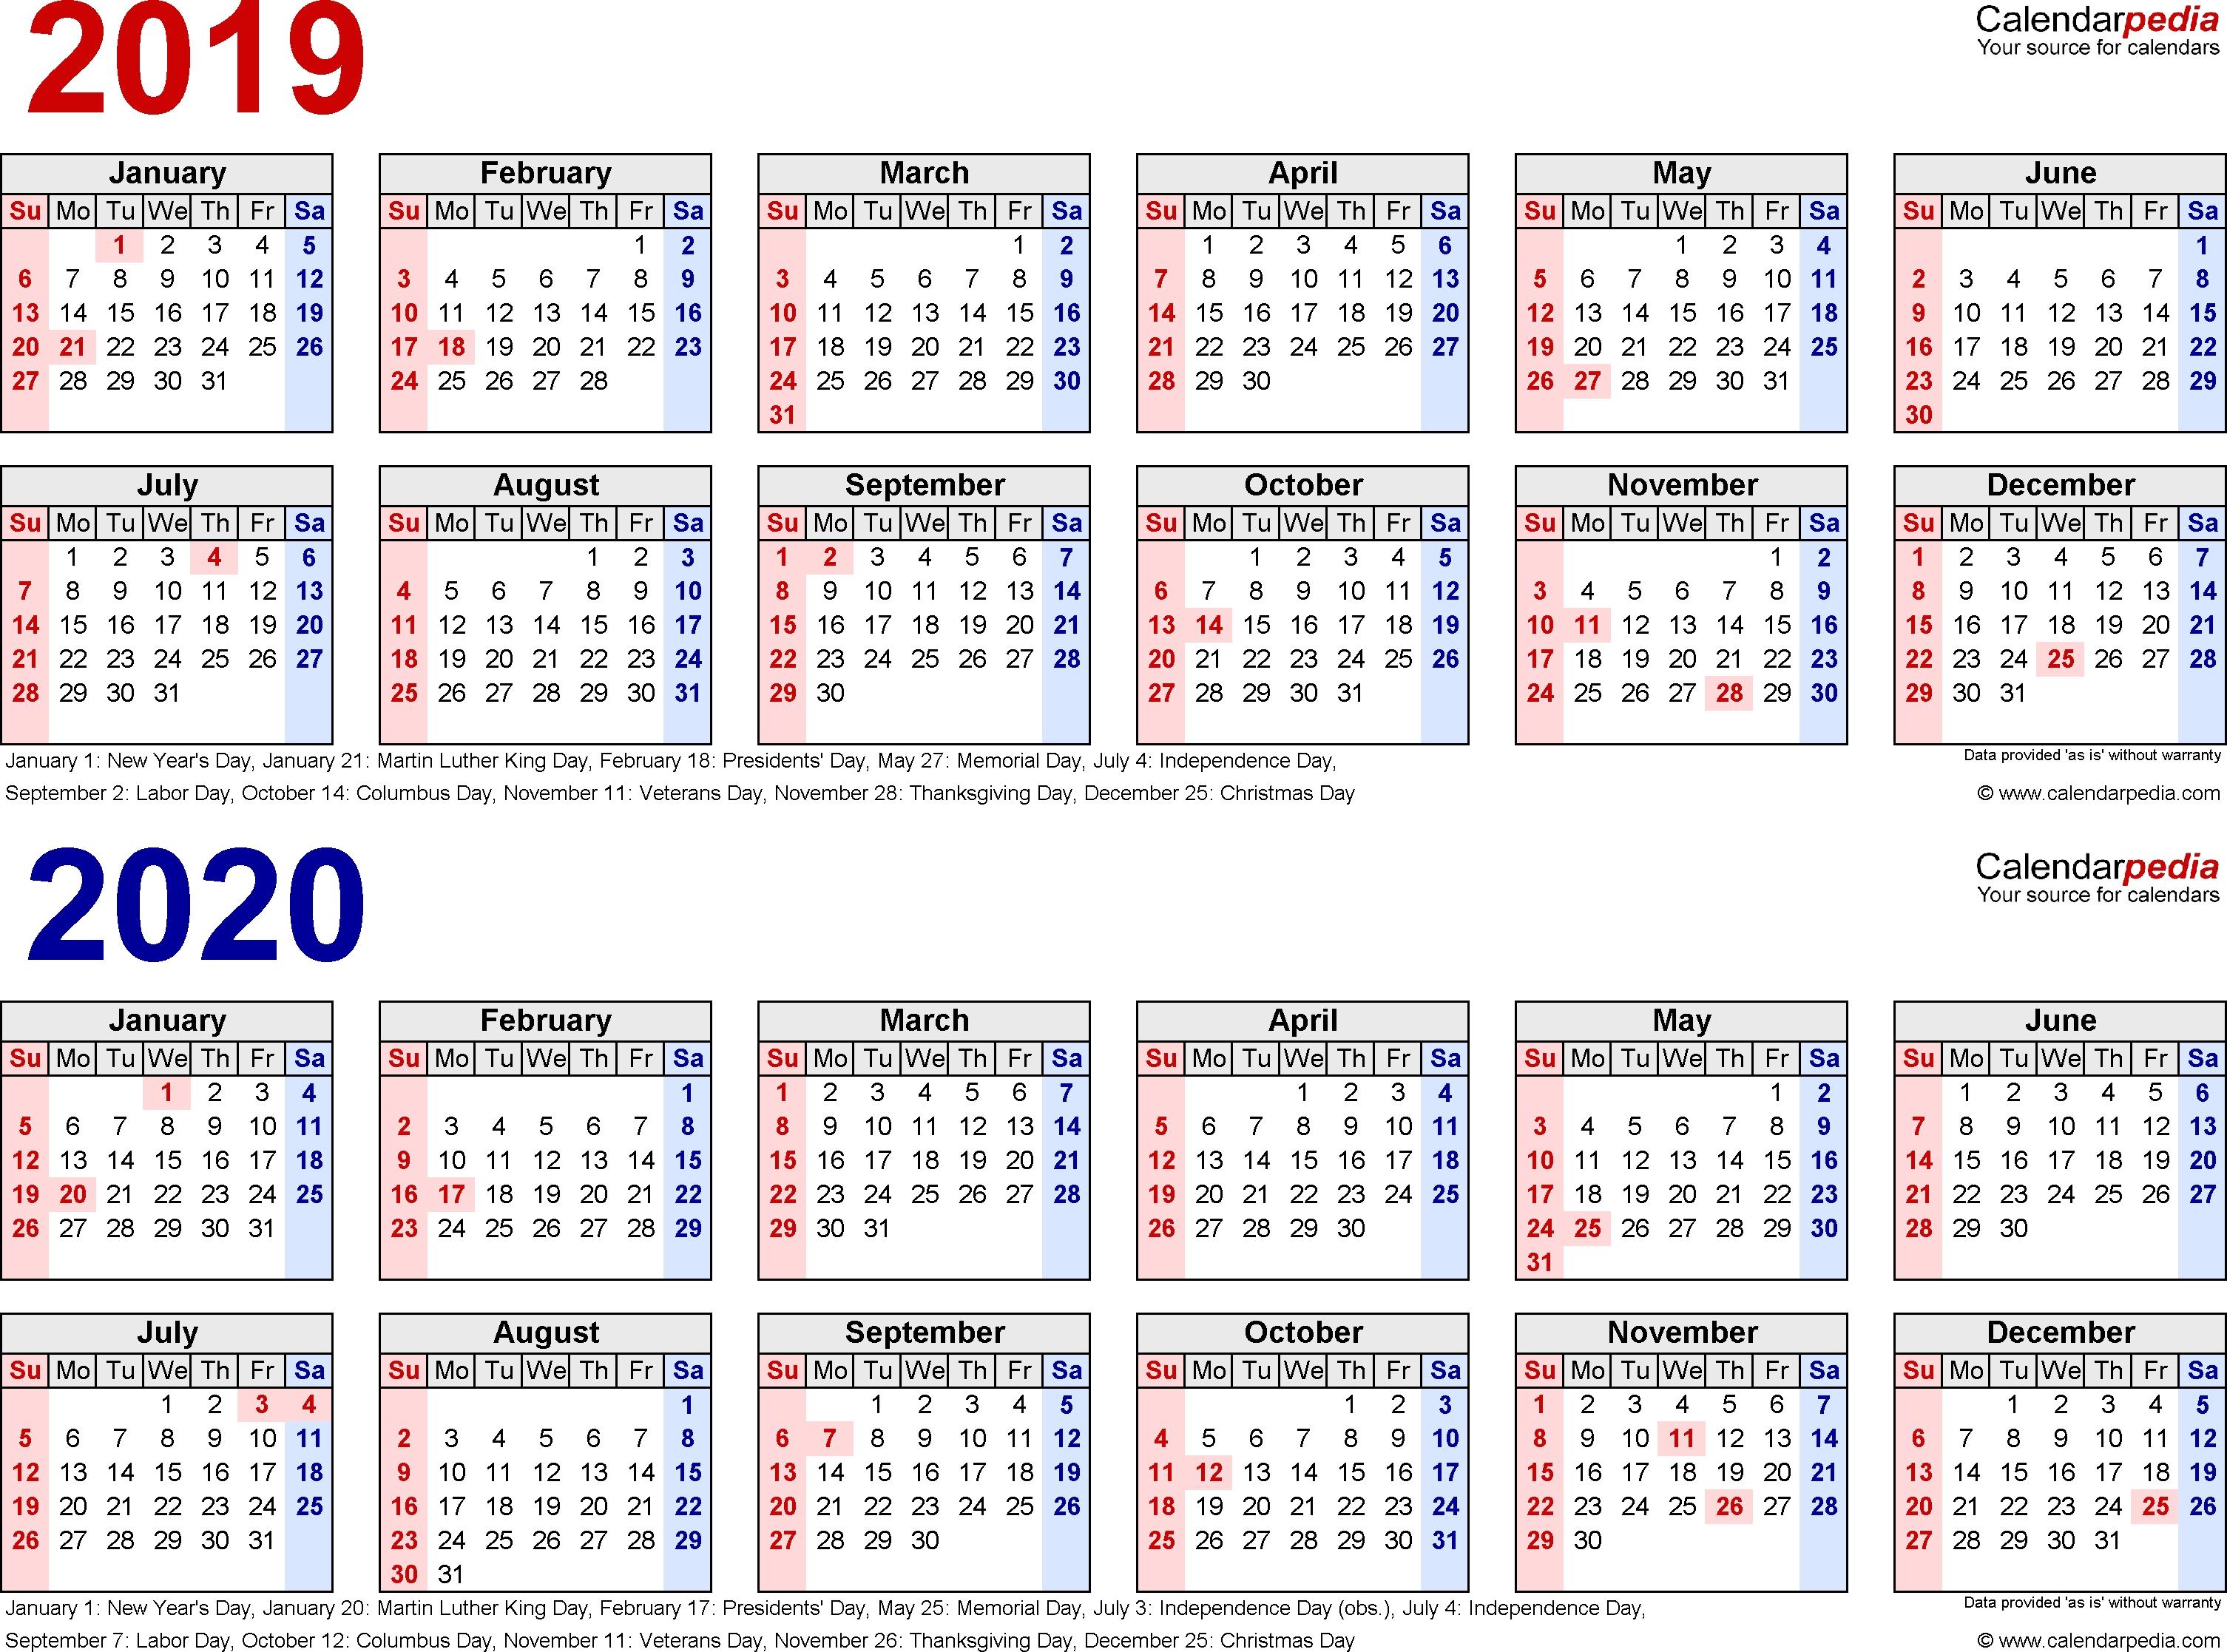 2019-2020 Two Year Calendar - Free Printable Pdf Templates regarding Blank Calendar 2019 2020 To Fill In